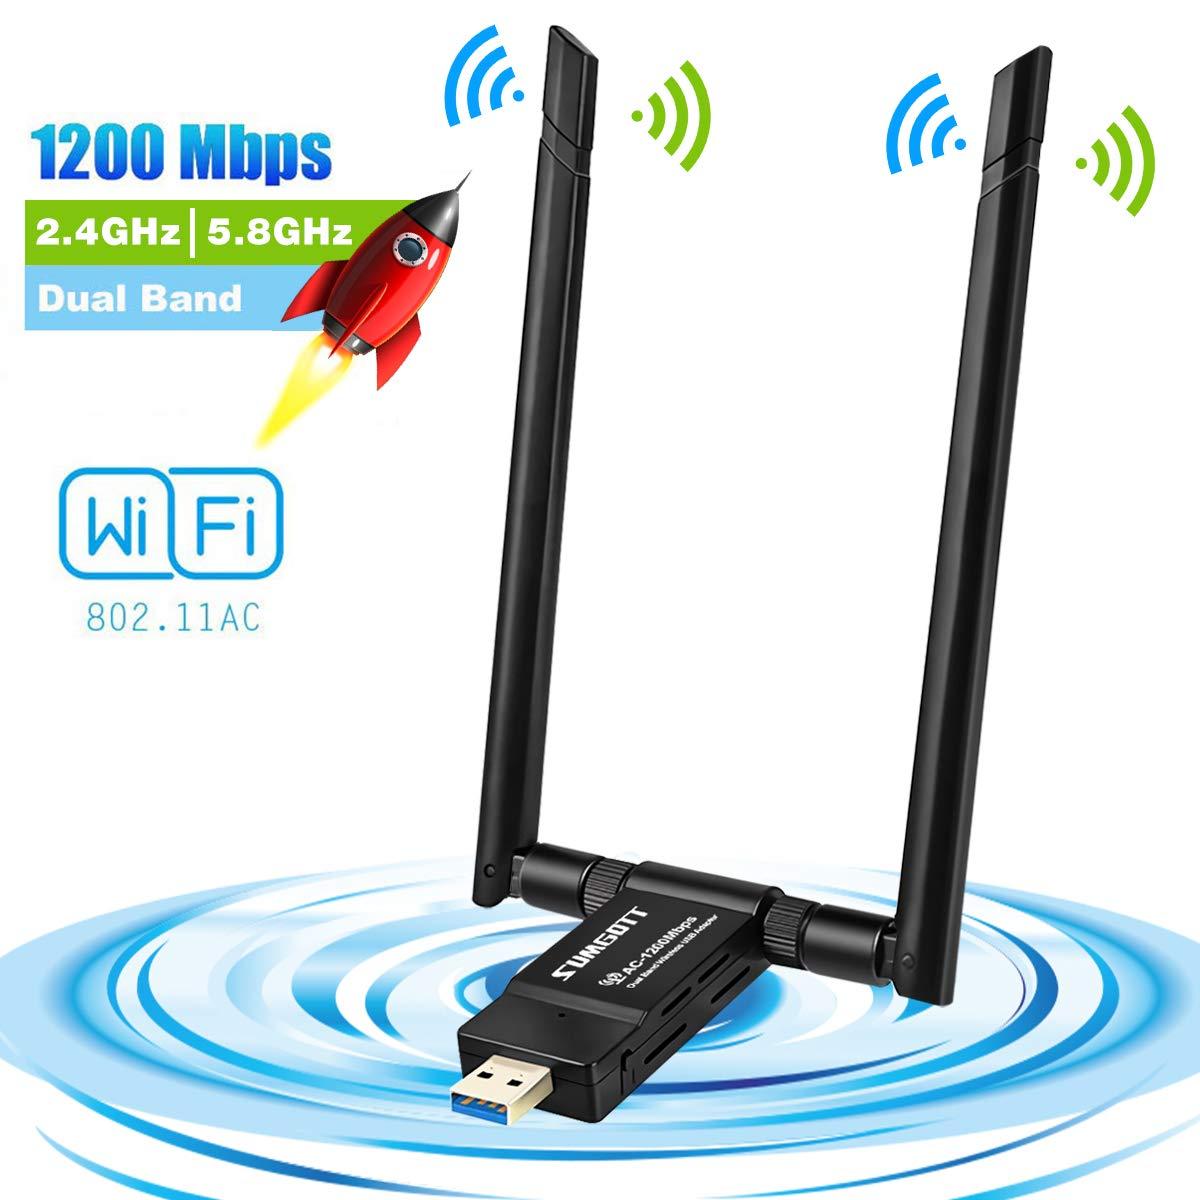 WiFi USB Adapter, WiFi Antenna USB WiFi Dongle USB 3.0 1200Mbps 5dBi WiFi USB Stick Dual Band 2.4GHz/5.8GH WiFi Adapter for PC Desktop Laptop MAC OS X Windows XP/Vista/7/8/10